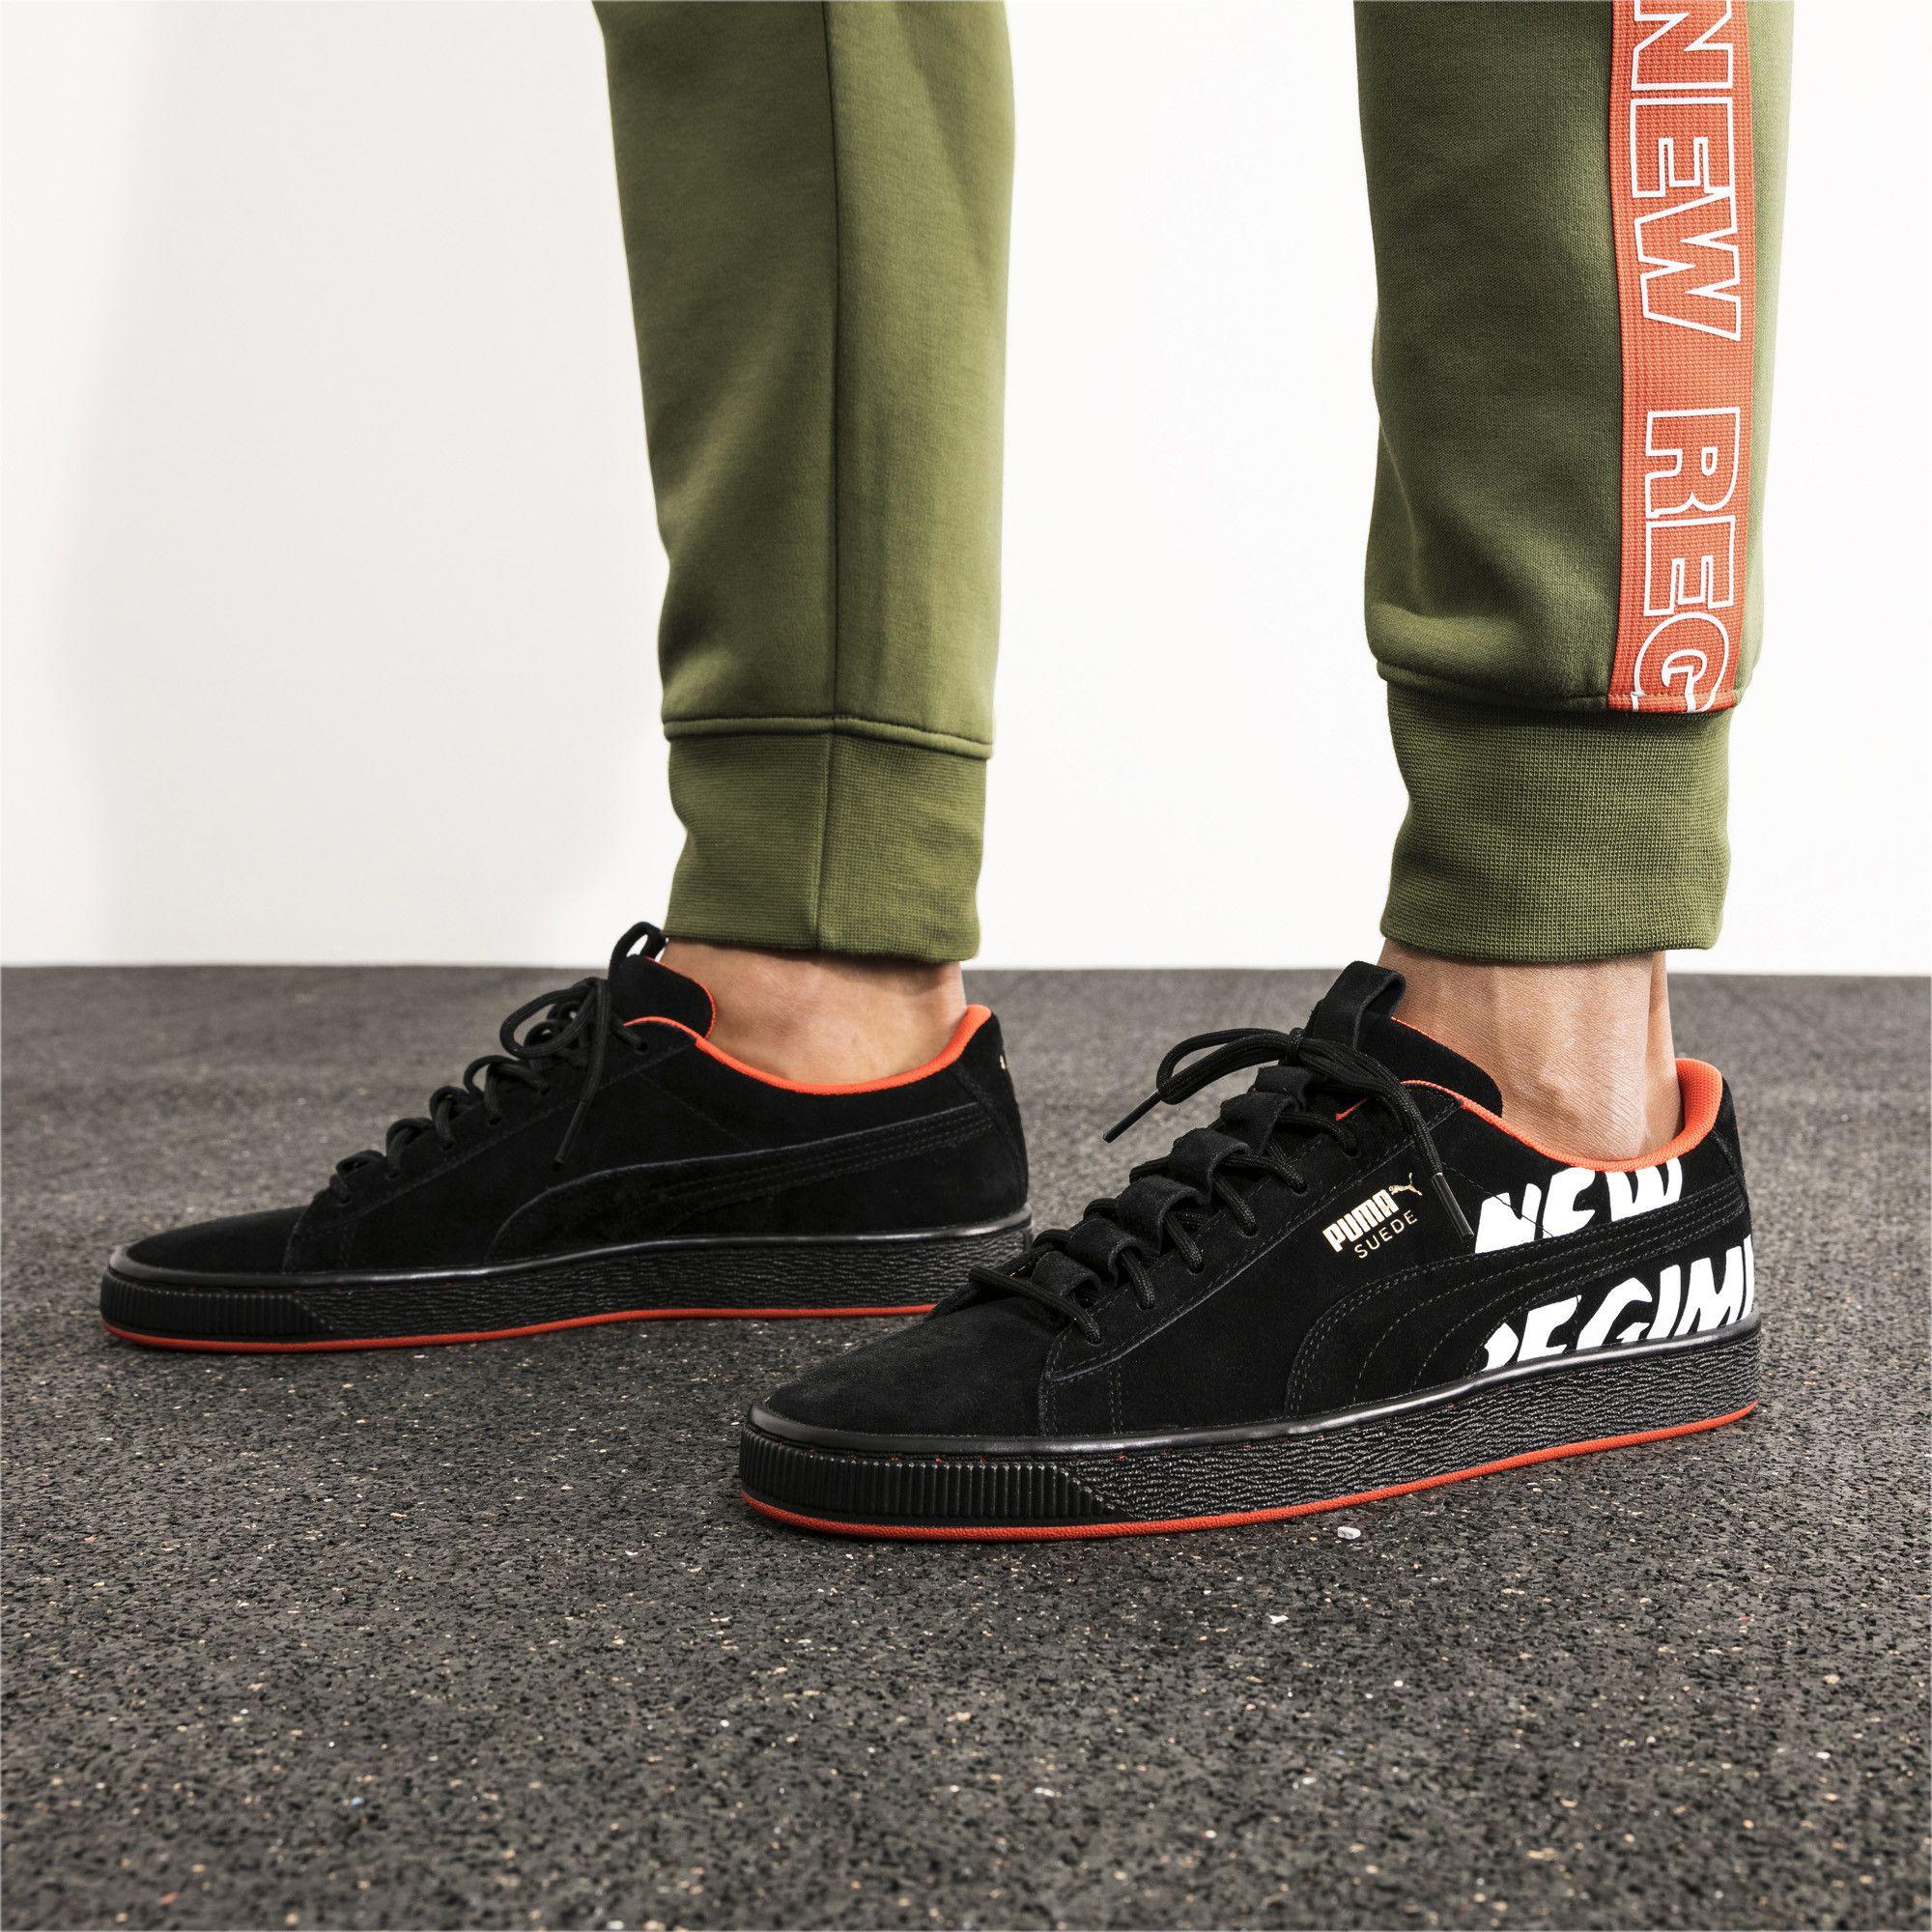 5f3e83beed PUMA x ATELIER NEW REGIME Suede Sneakers | Scarlet Ibis-Scarlet Ibis size 7